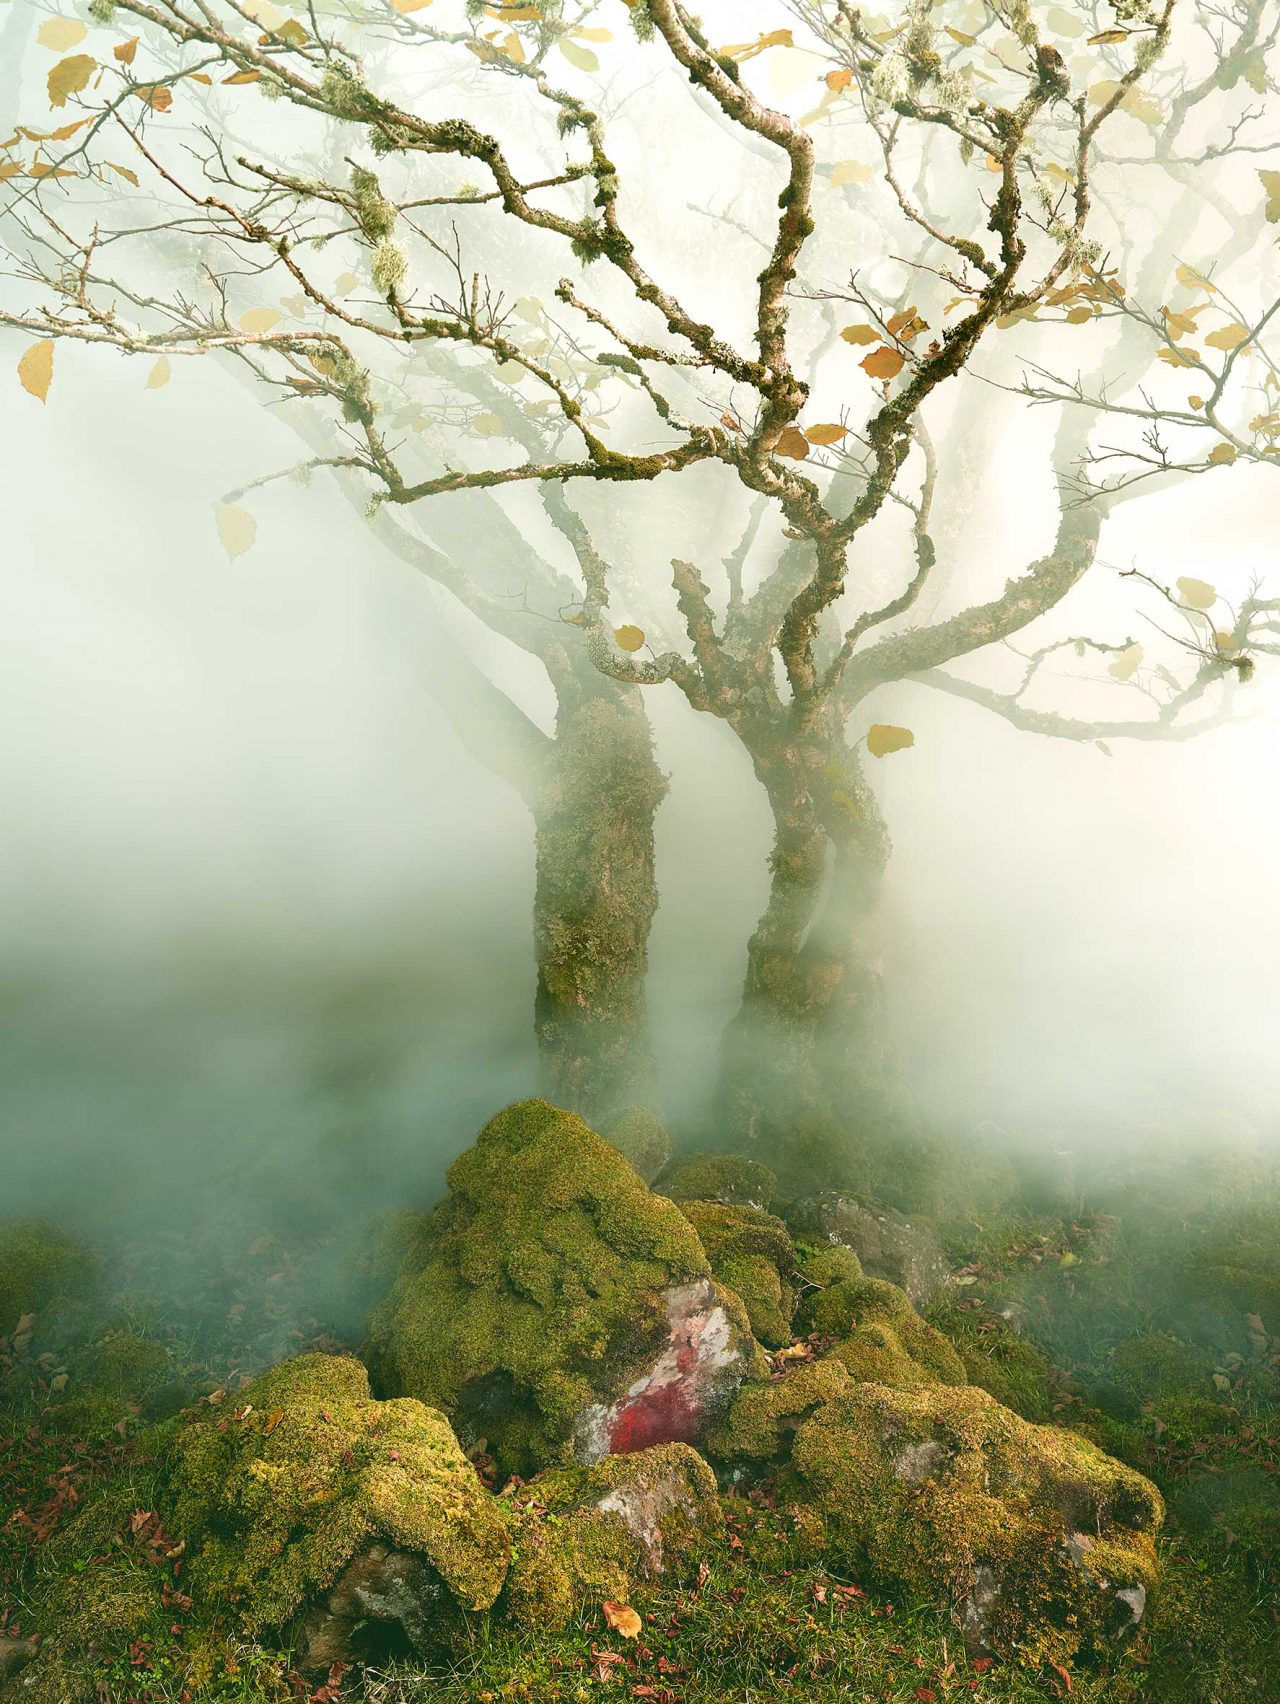 Albert Watson, Tree in Mist, Fairy Glen, Isle of Skye, Scotland, 2013